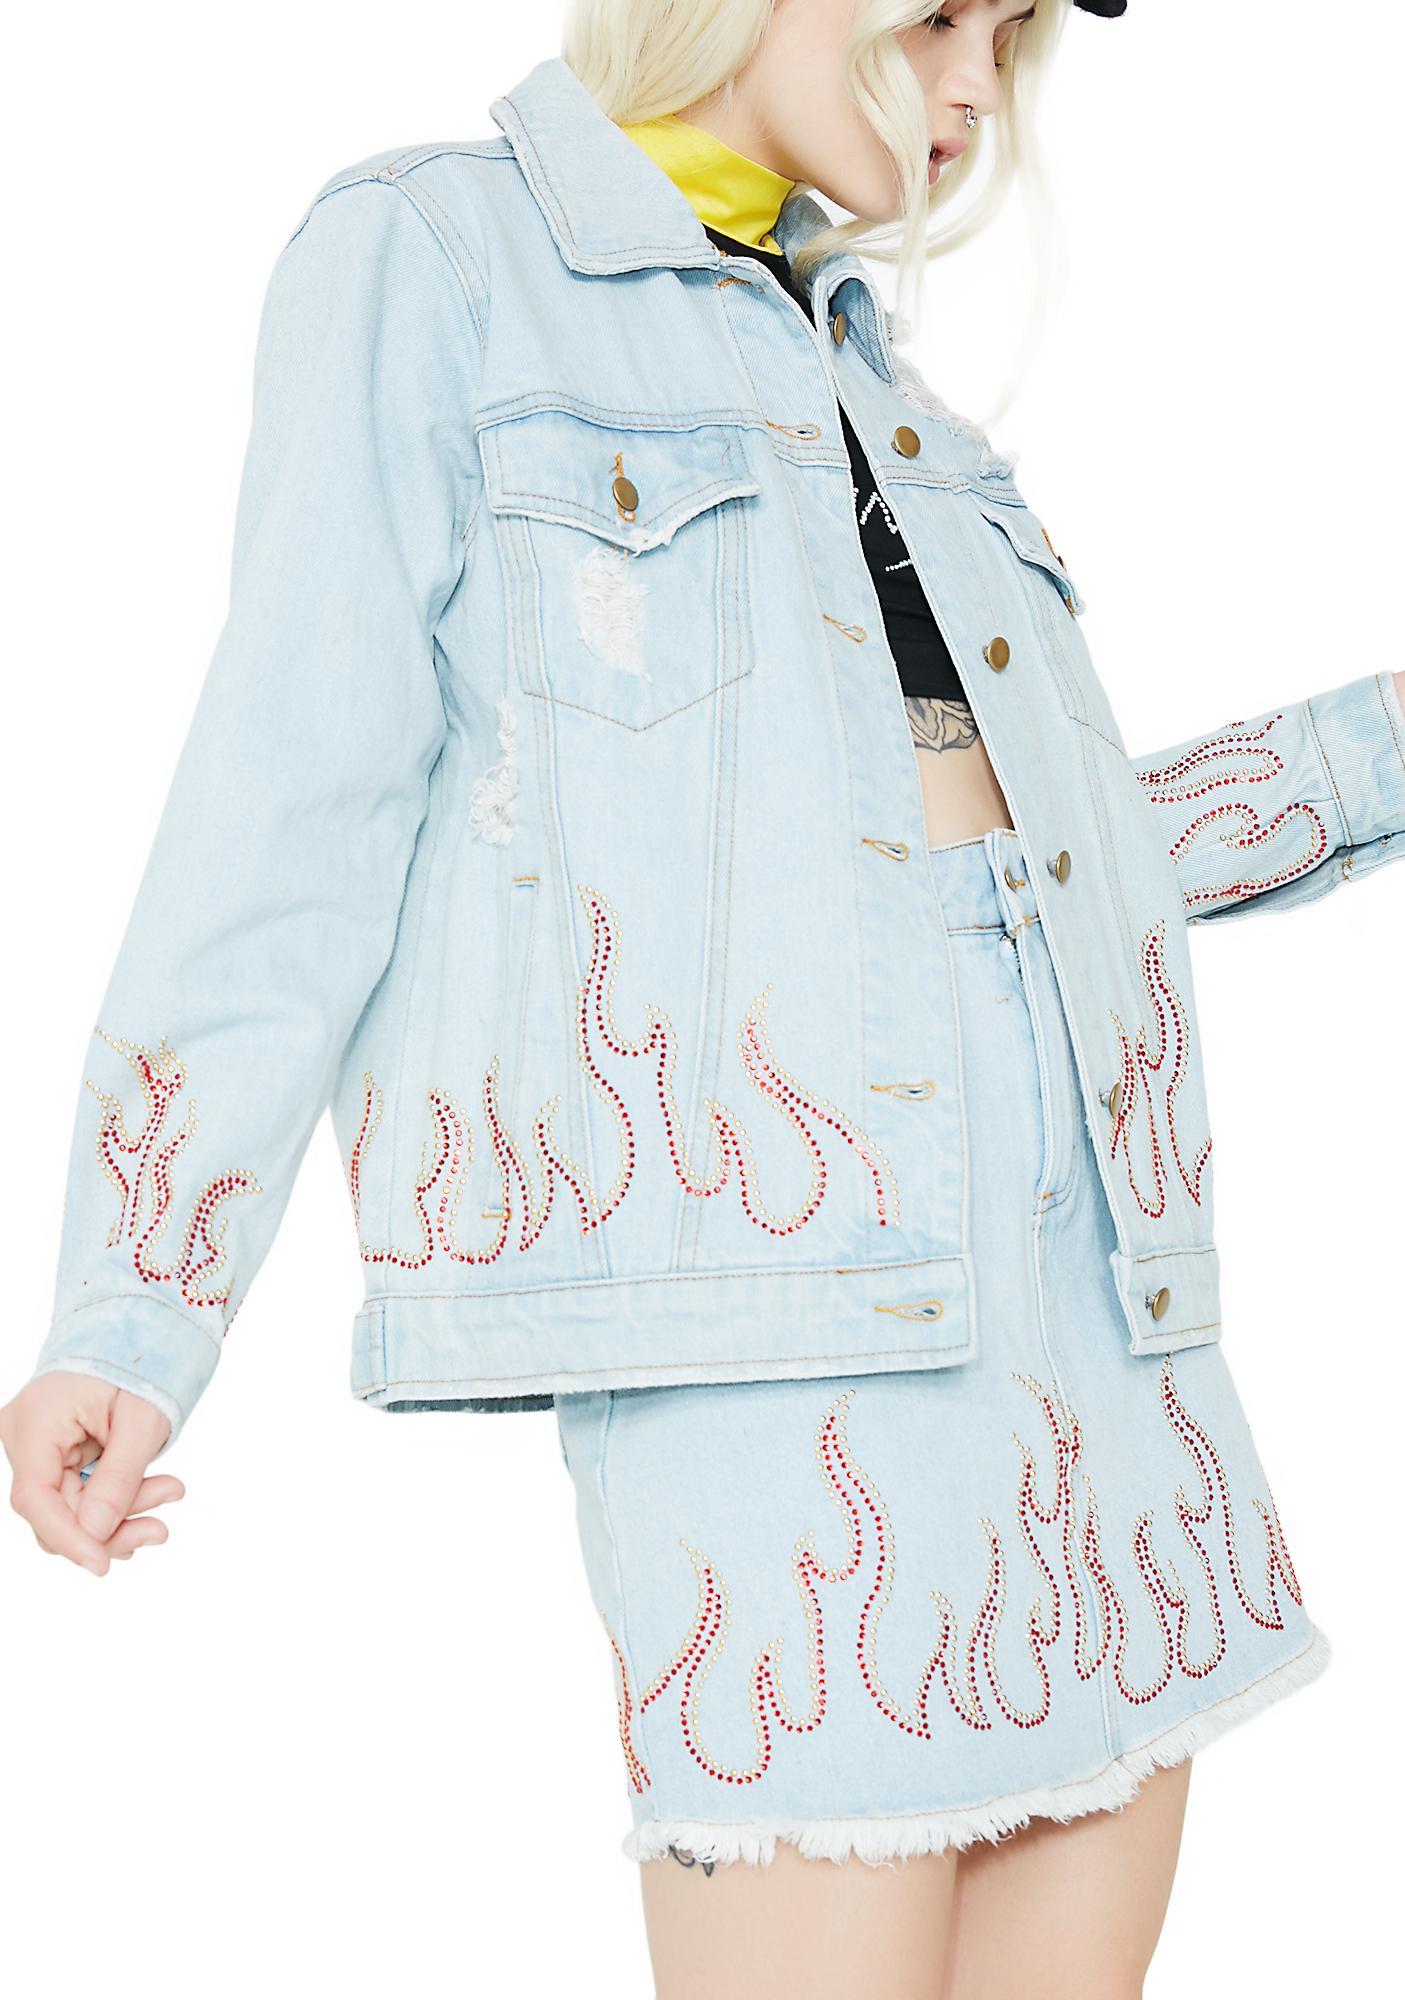 Wildfire Distressed Denim Jacket